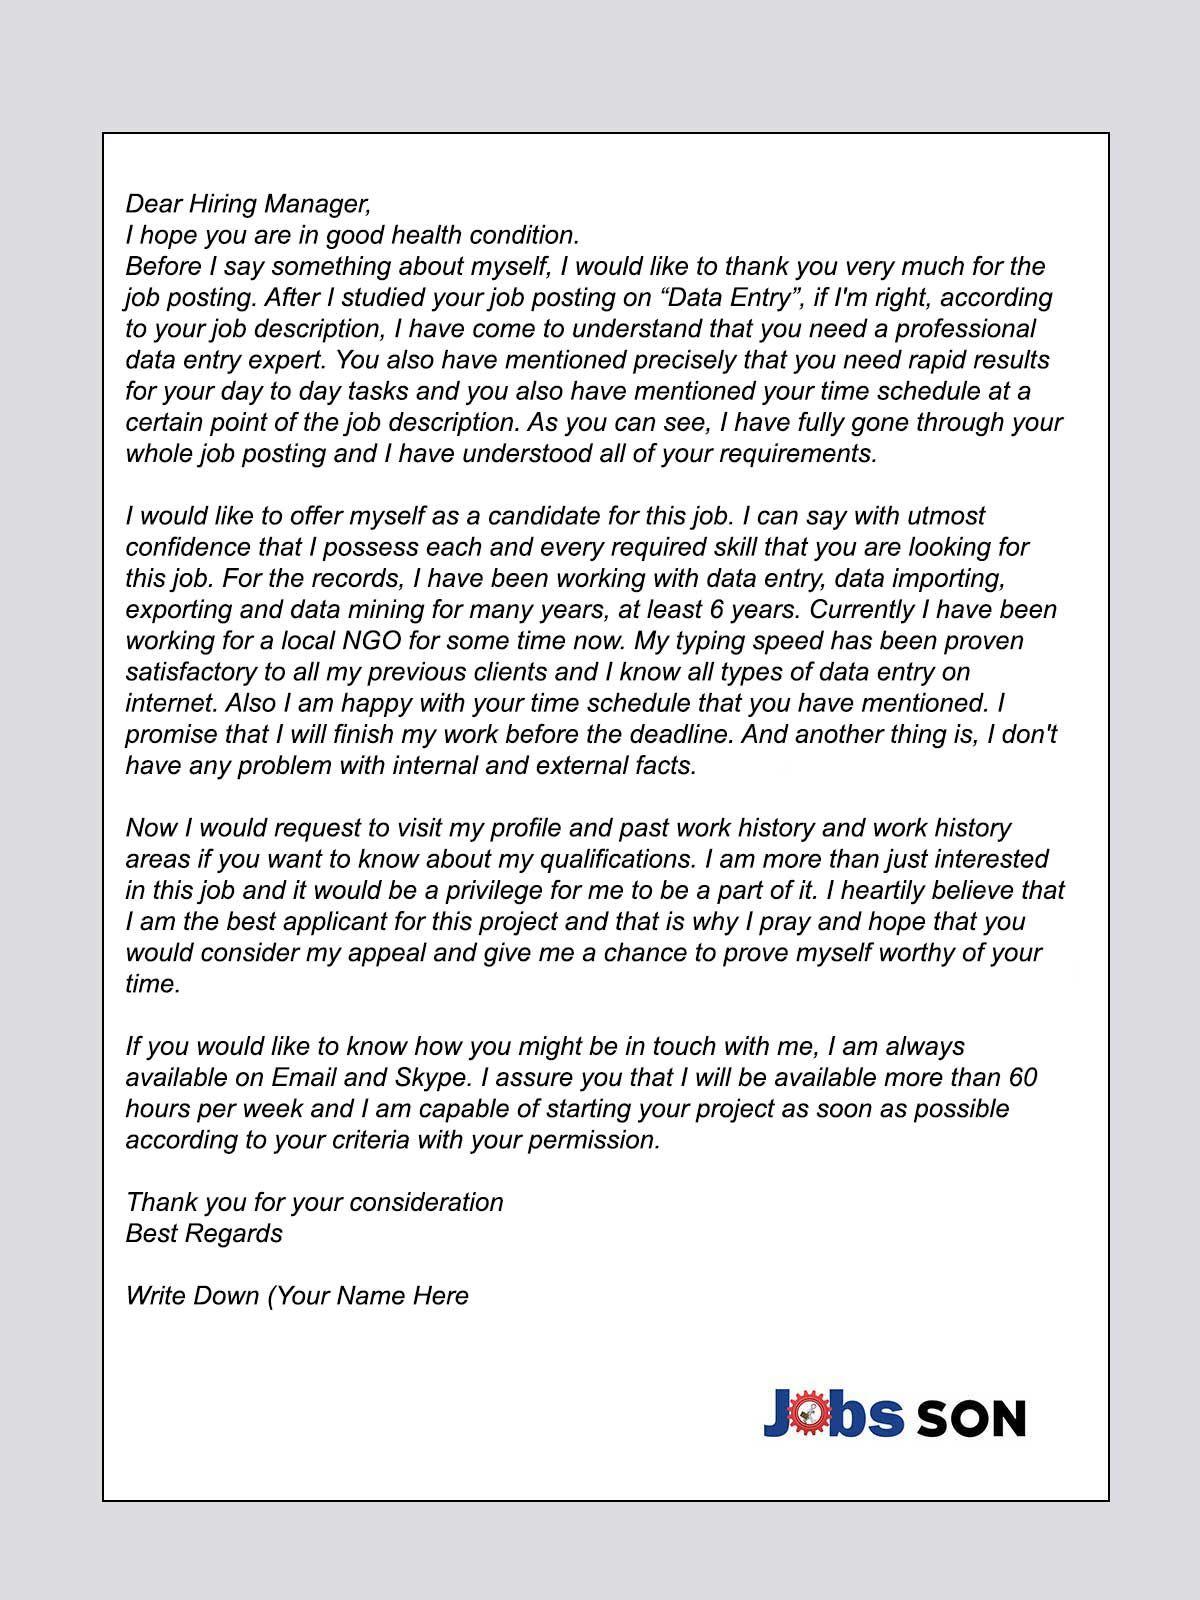 Upwork Proposal Cover Letter For Data